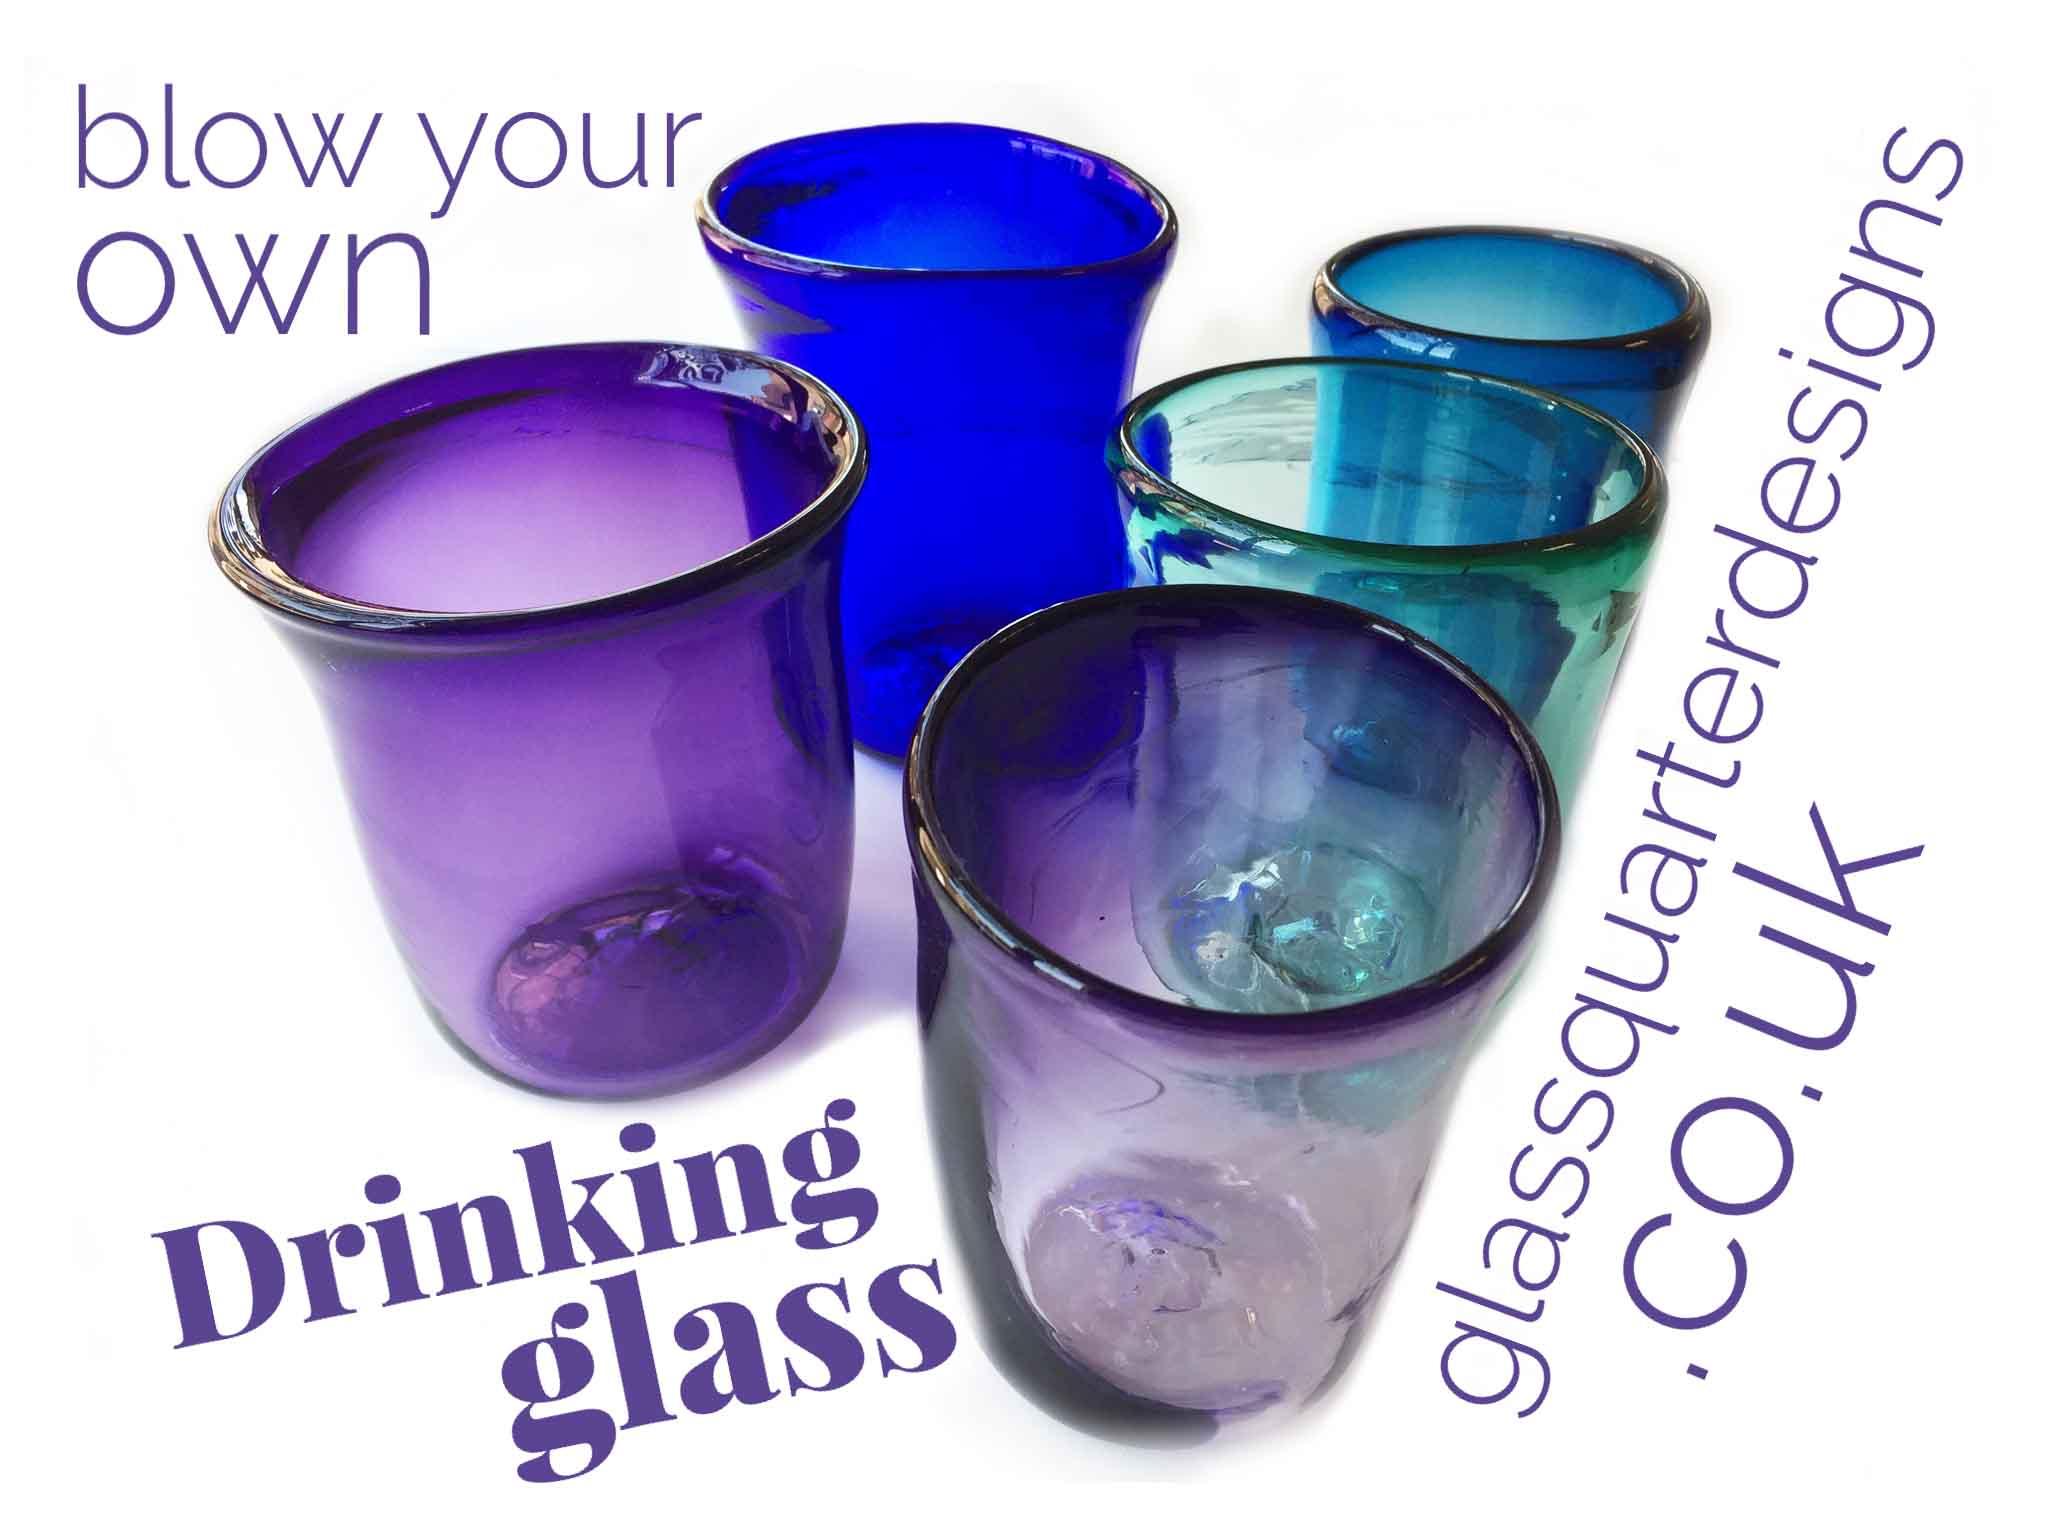 drinking glass web